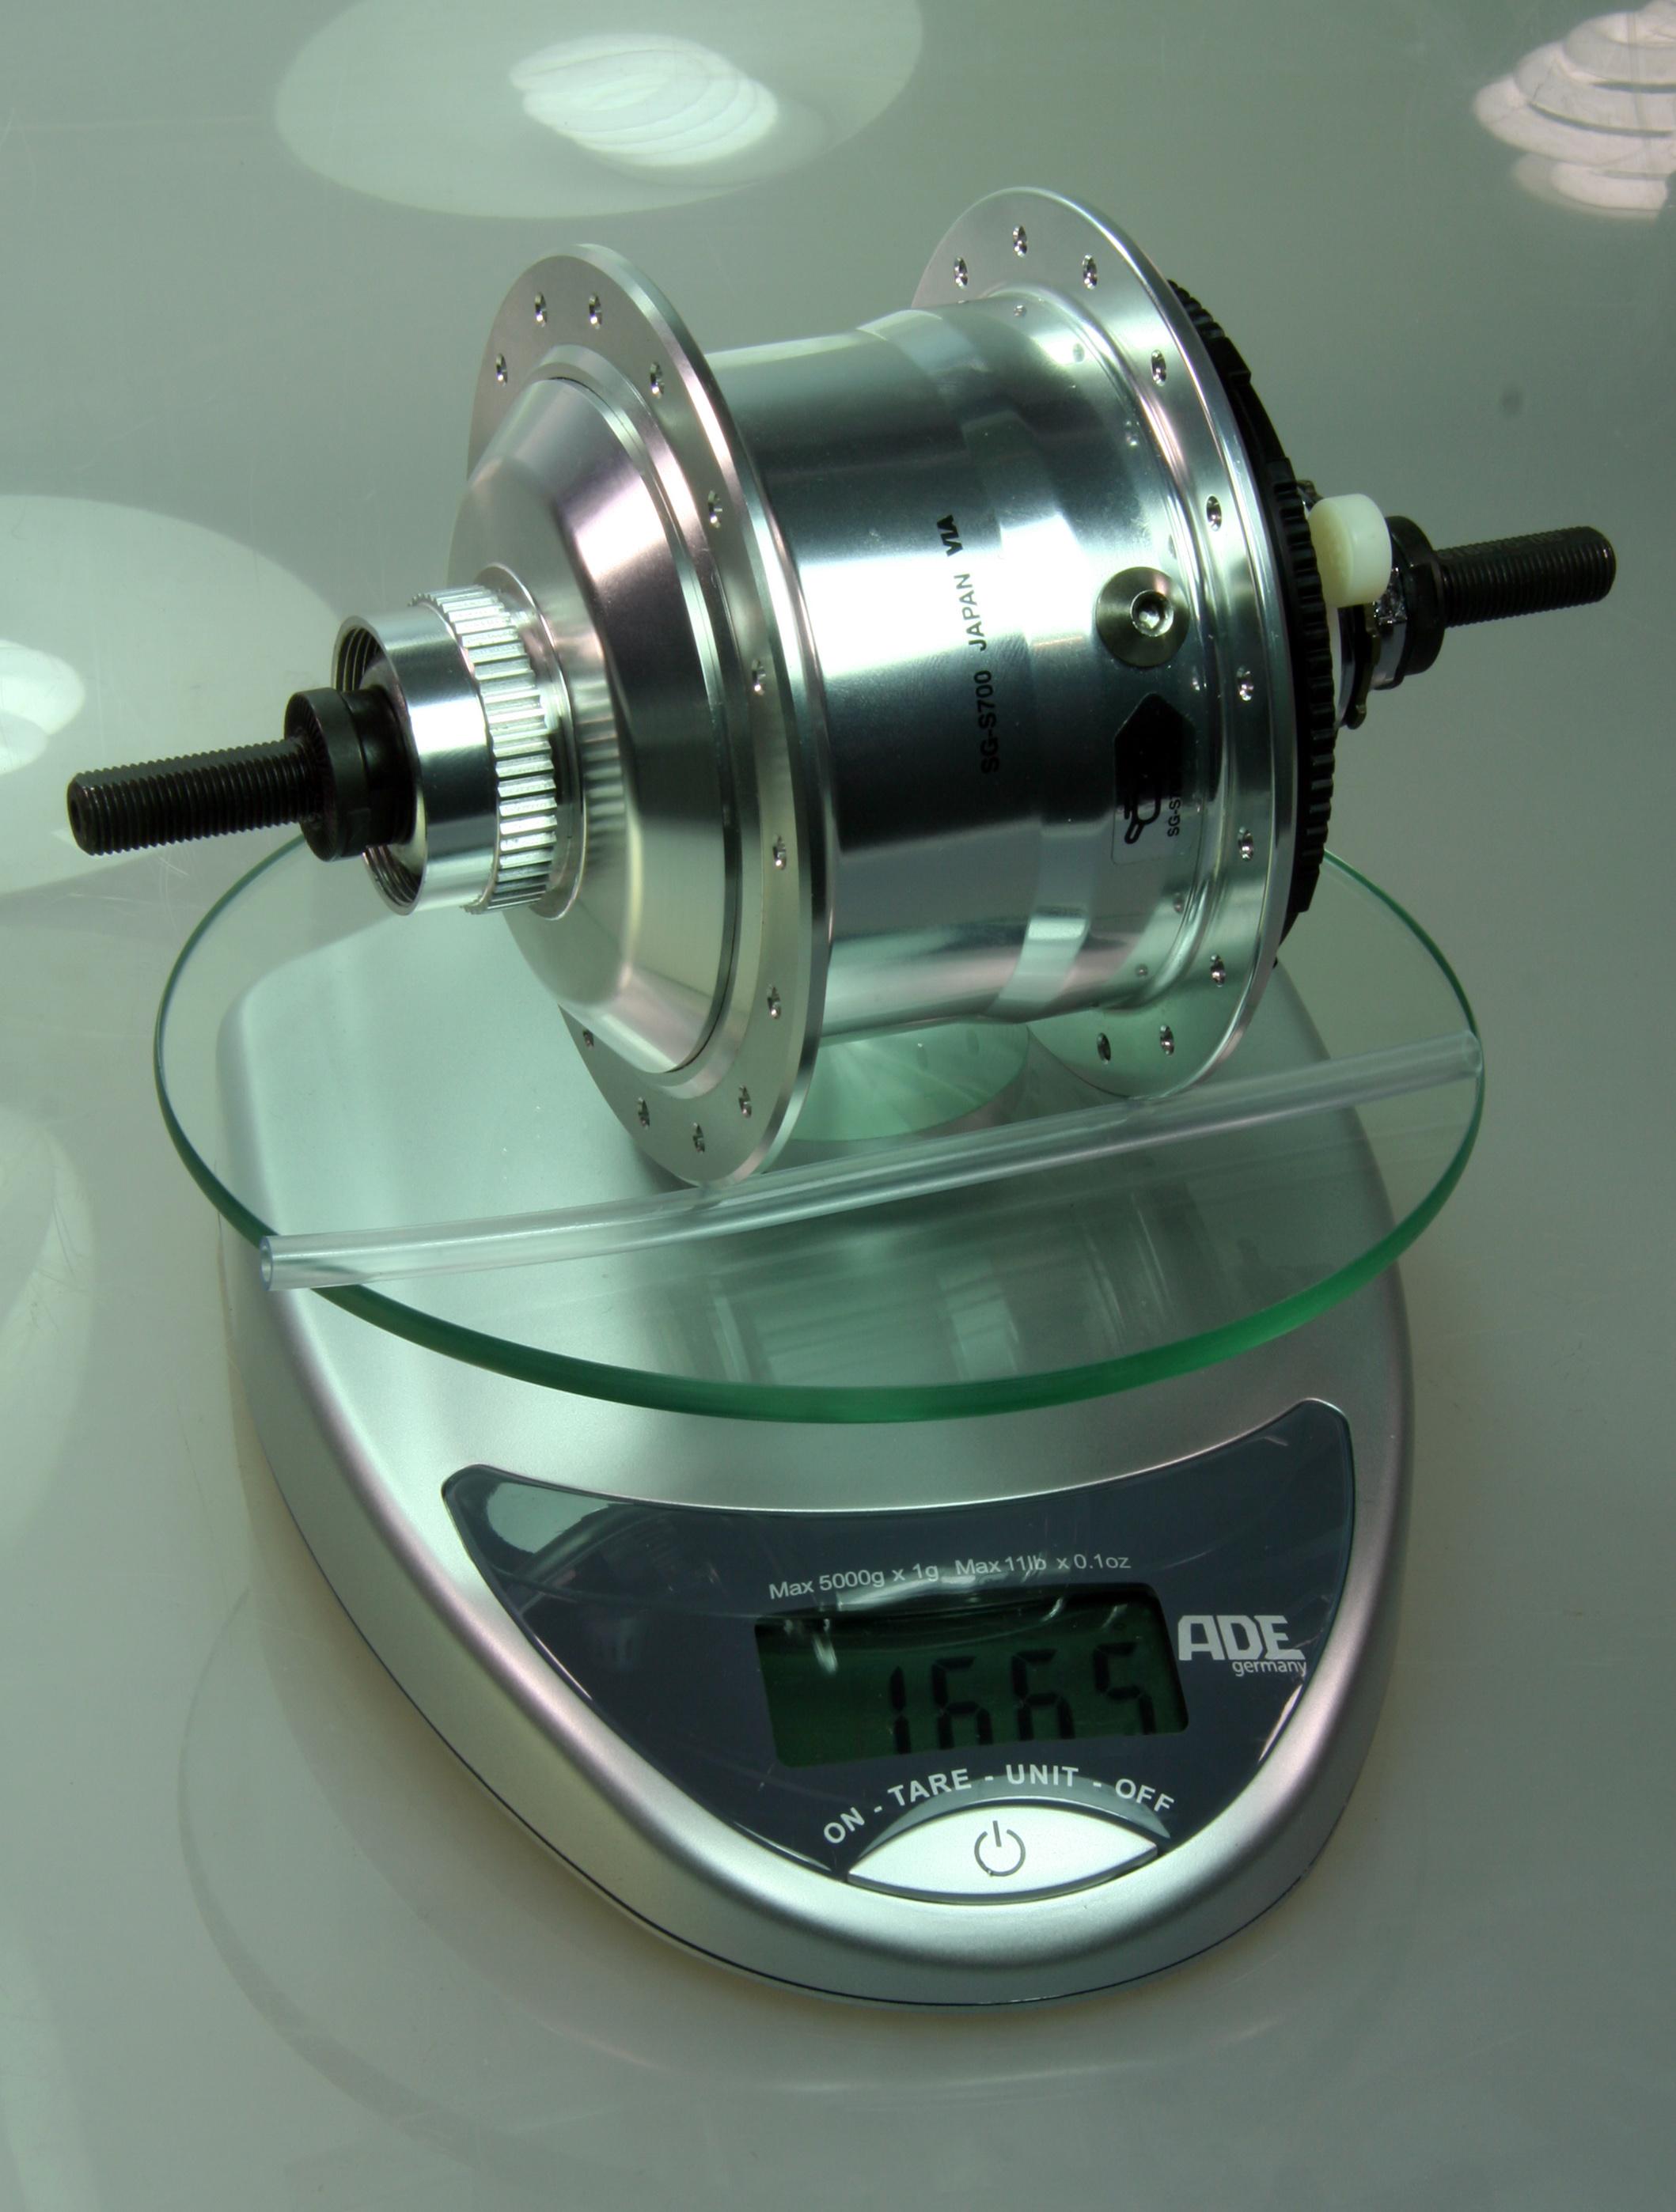 Nabenvergleich-rohloff-speedhub-shimano-alfine-01.jpg